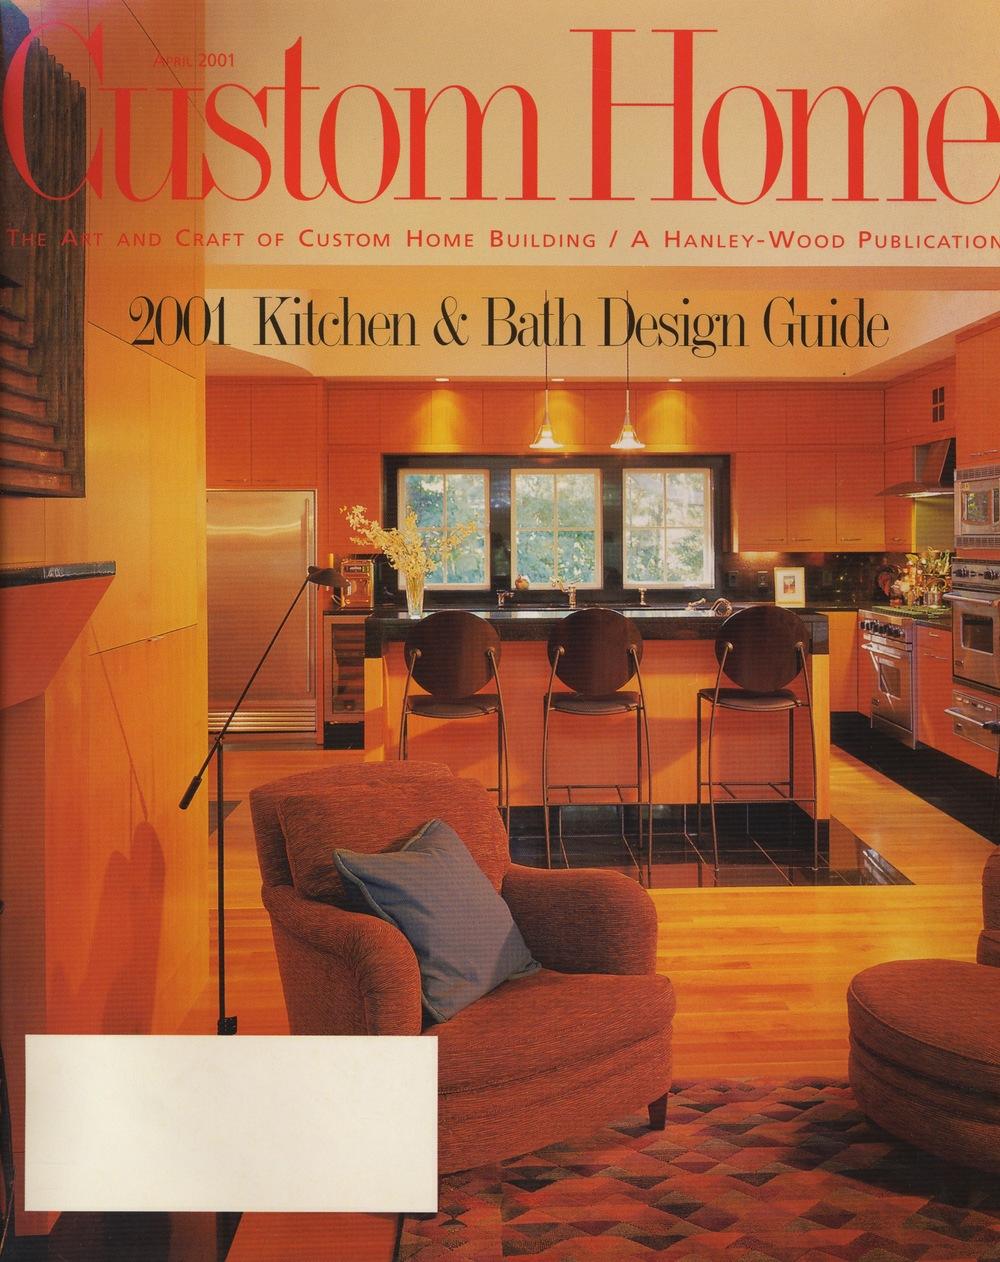 Custom Home - Crawfords - Cover.jpg